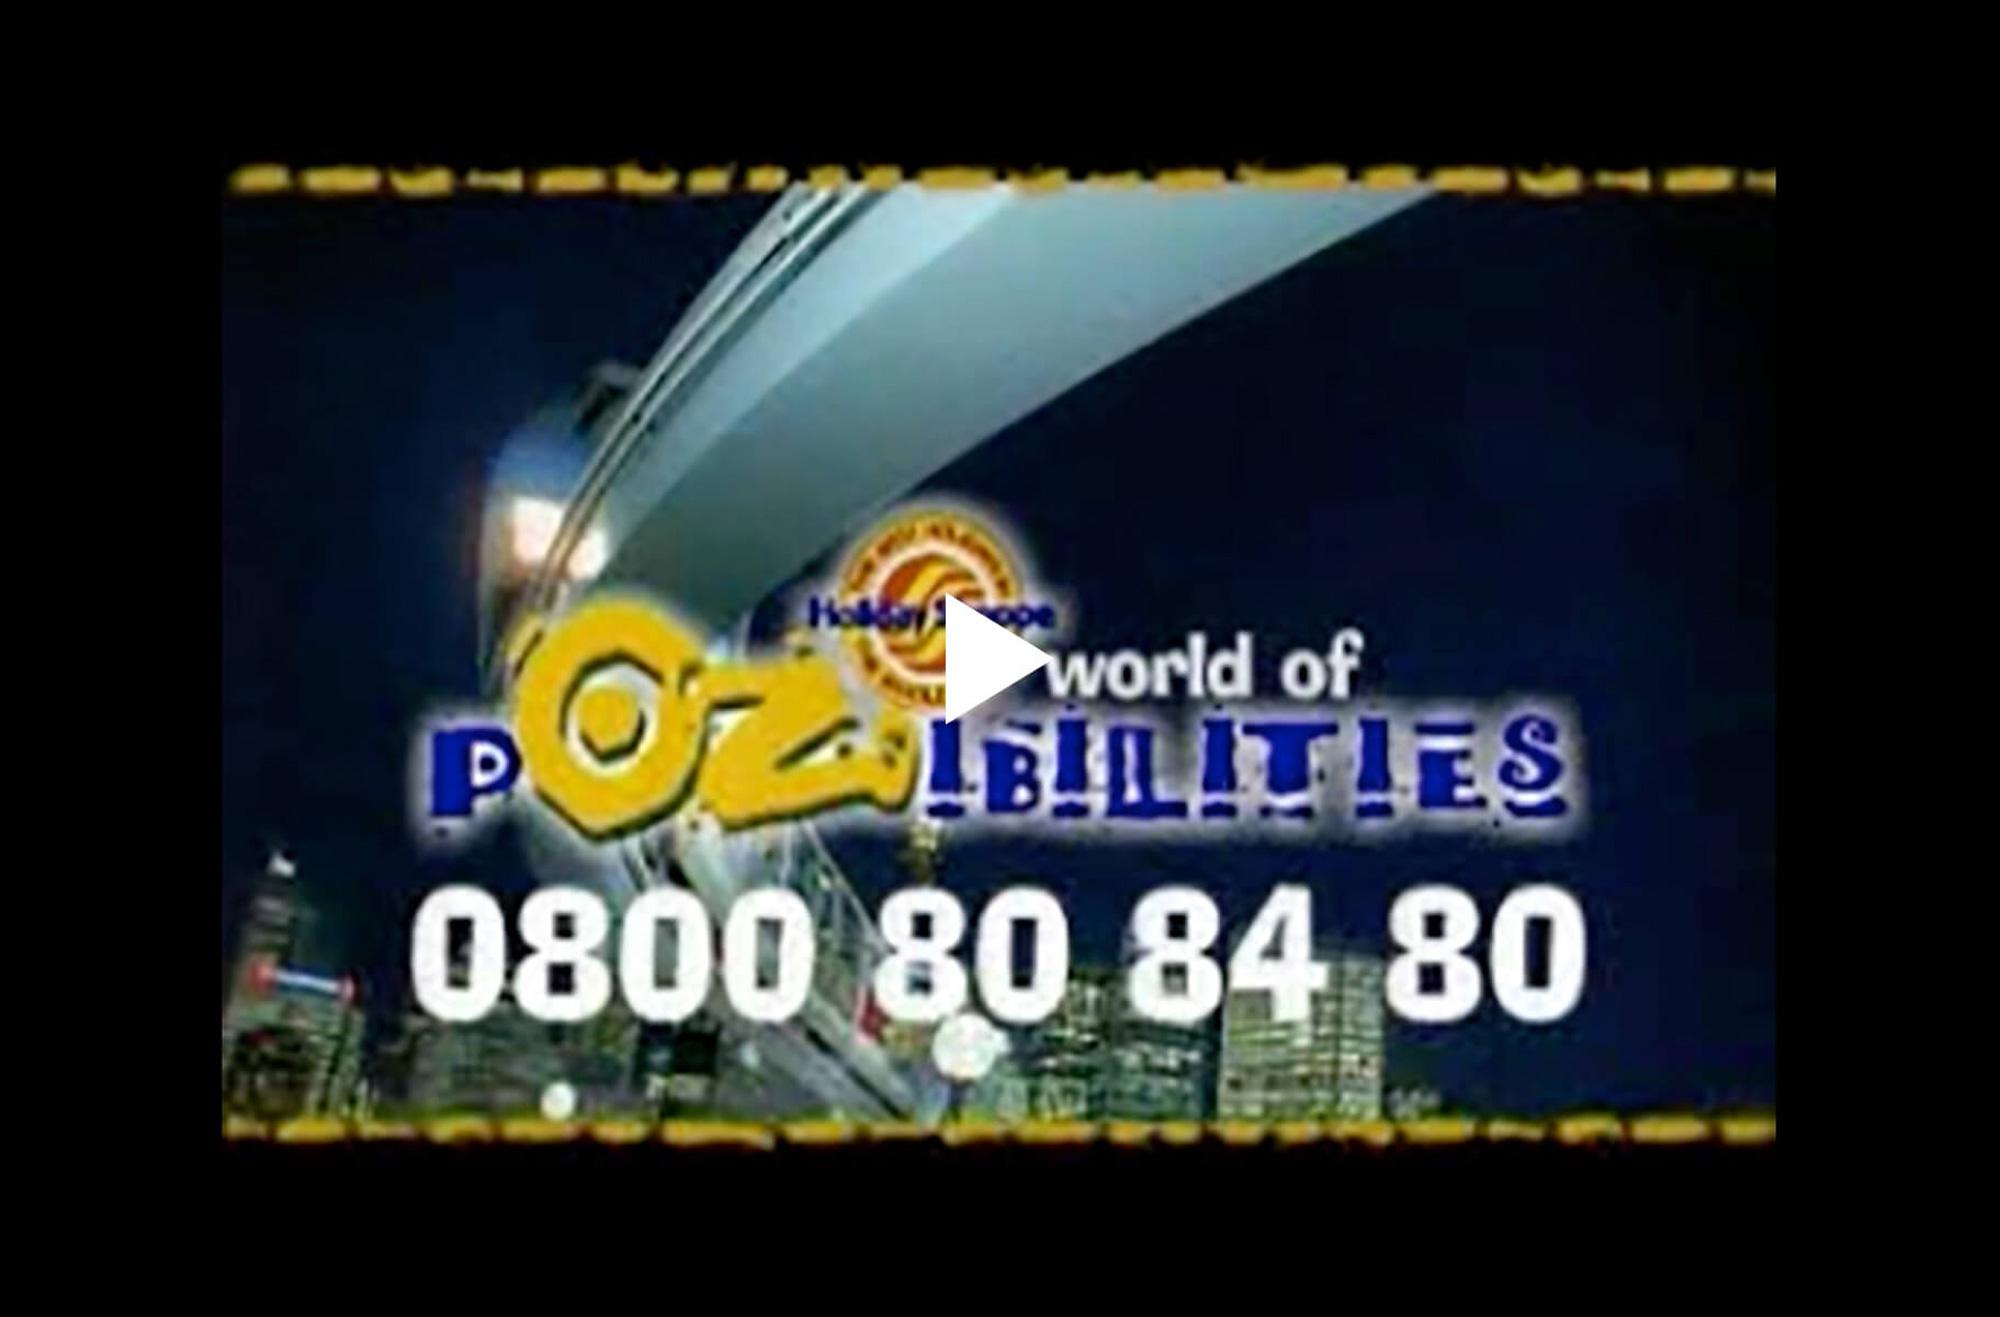 pozzibilities-image